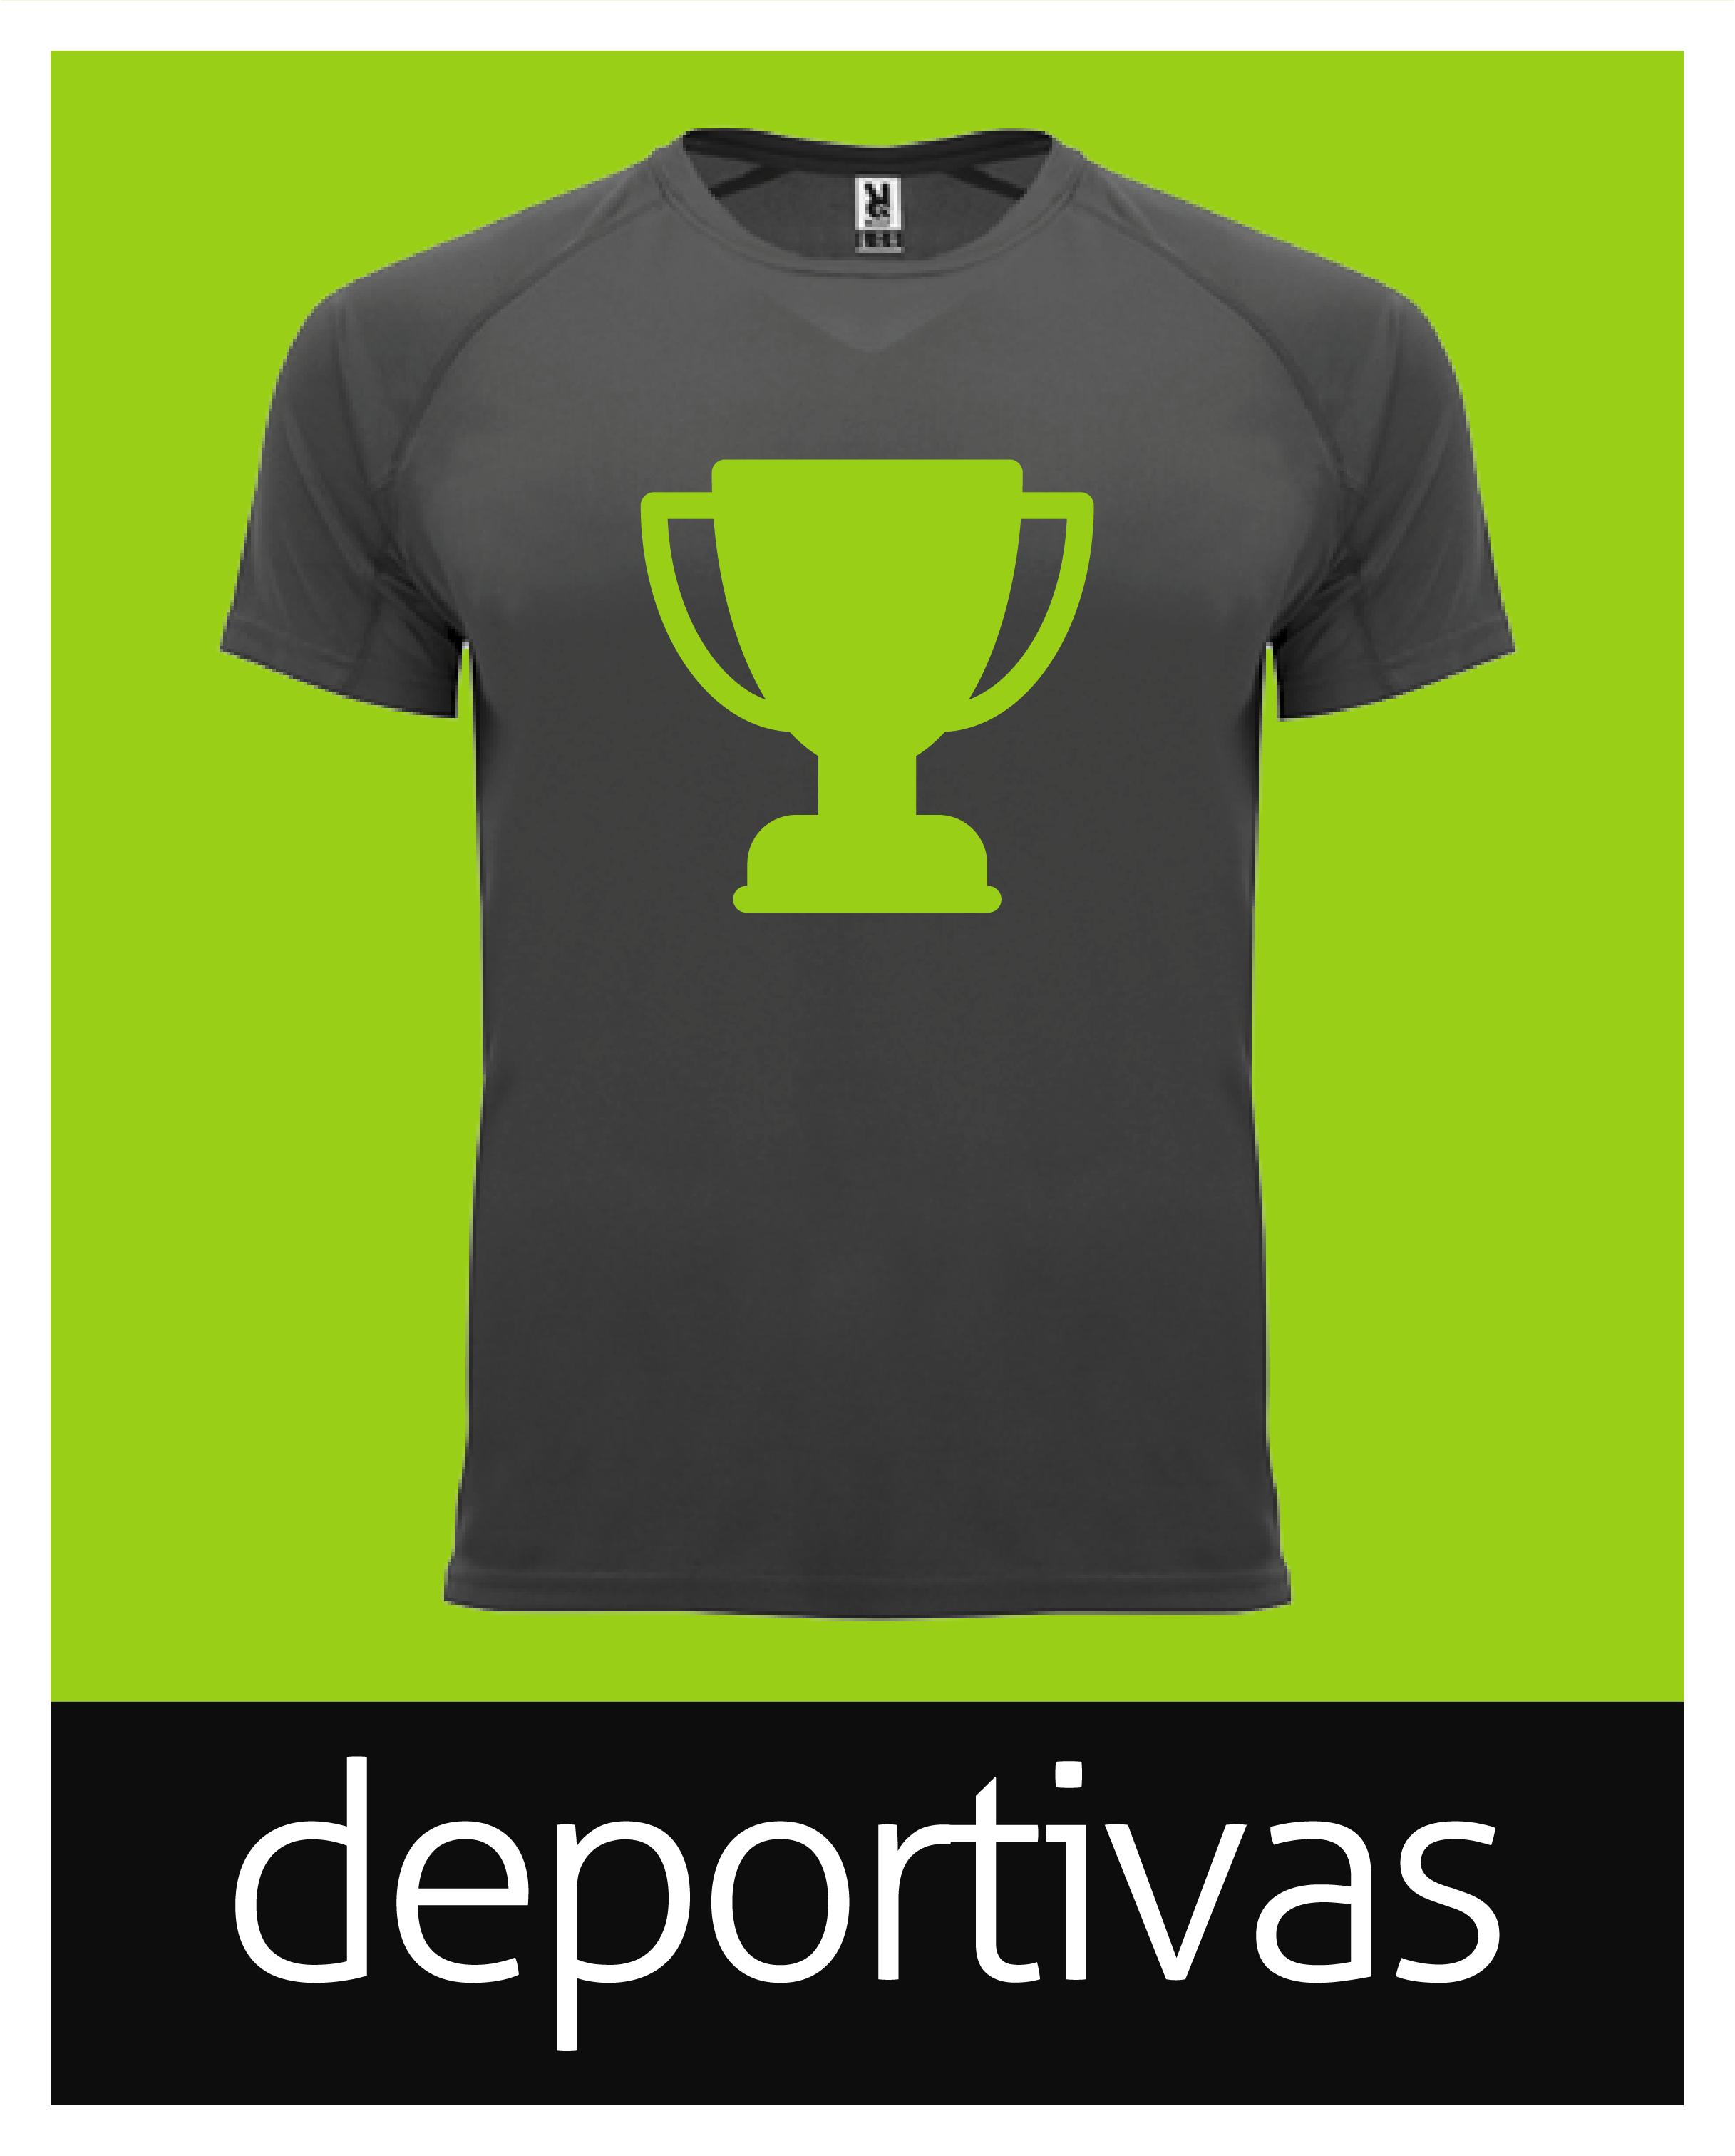 DEPORTIVAS.png